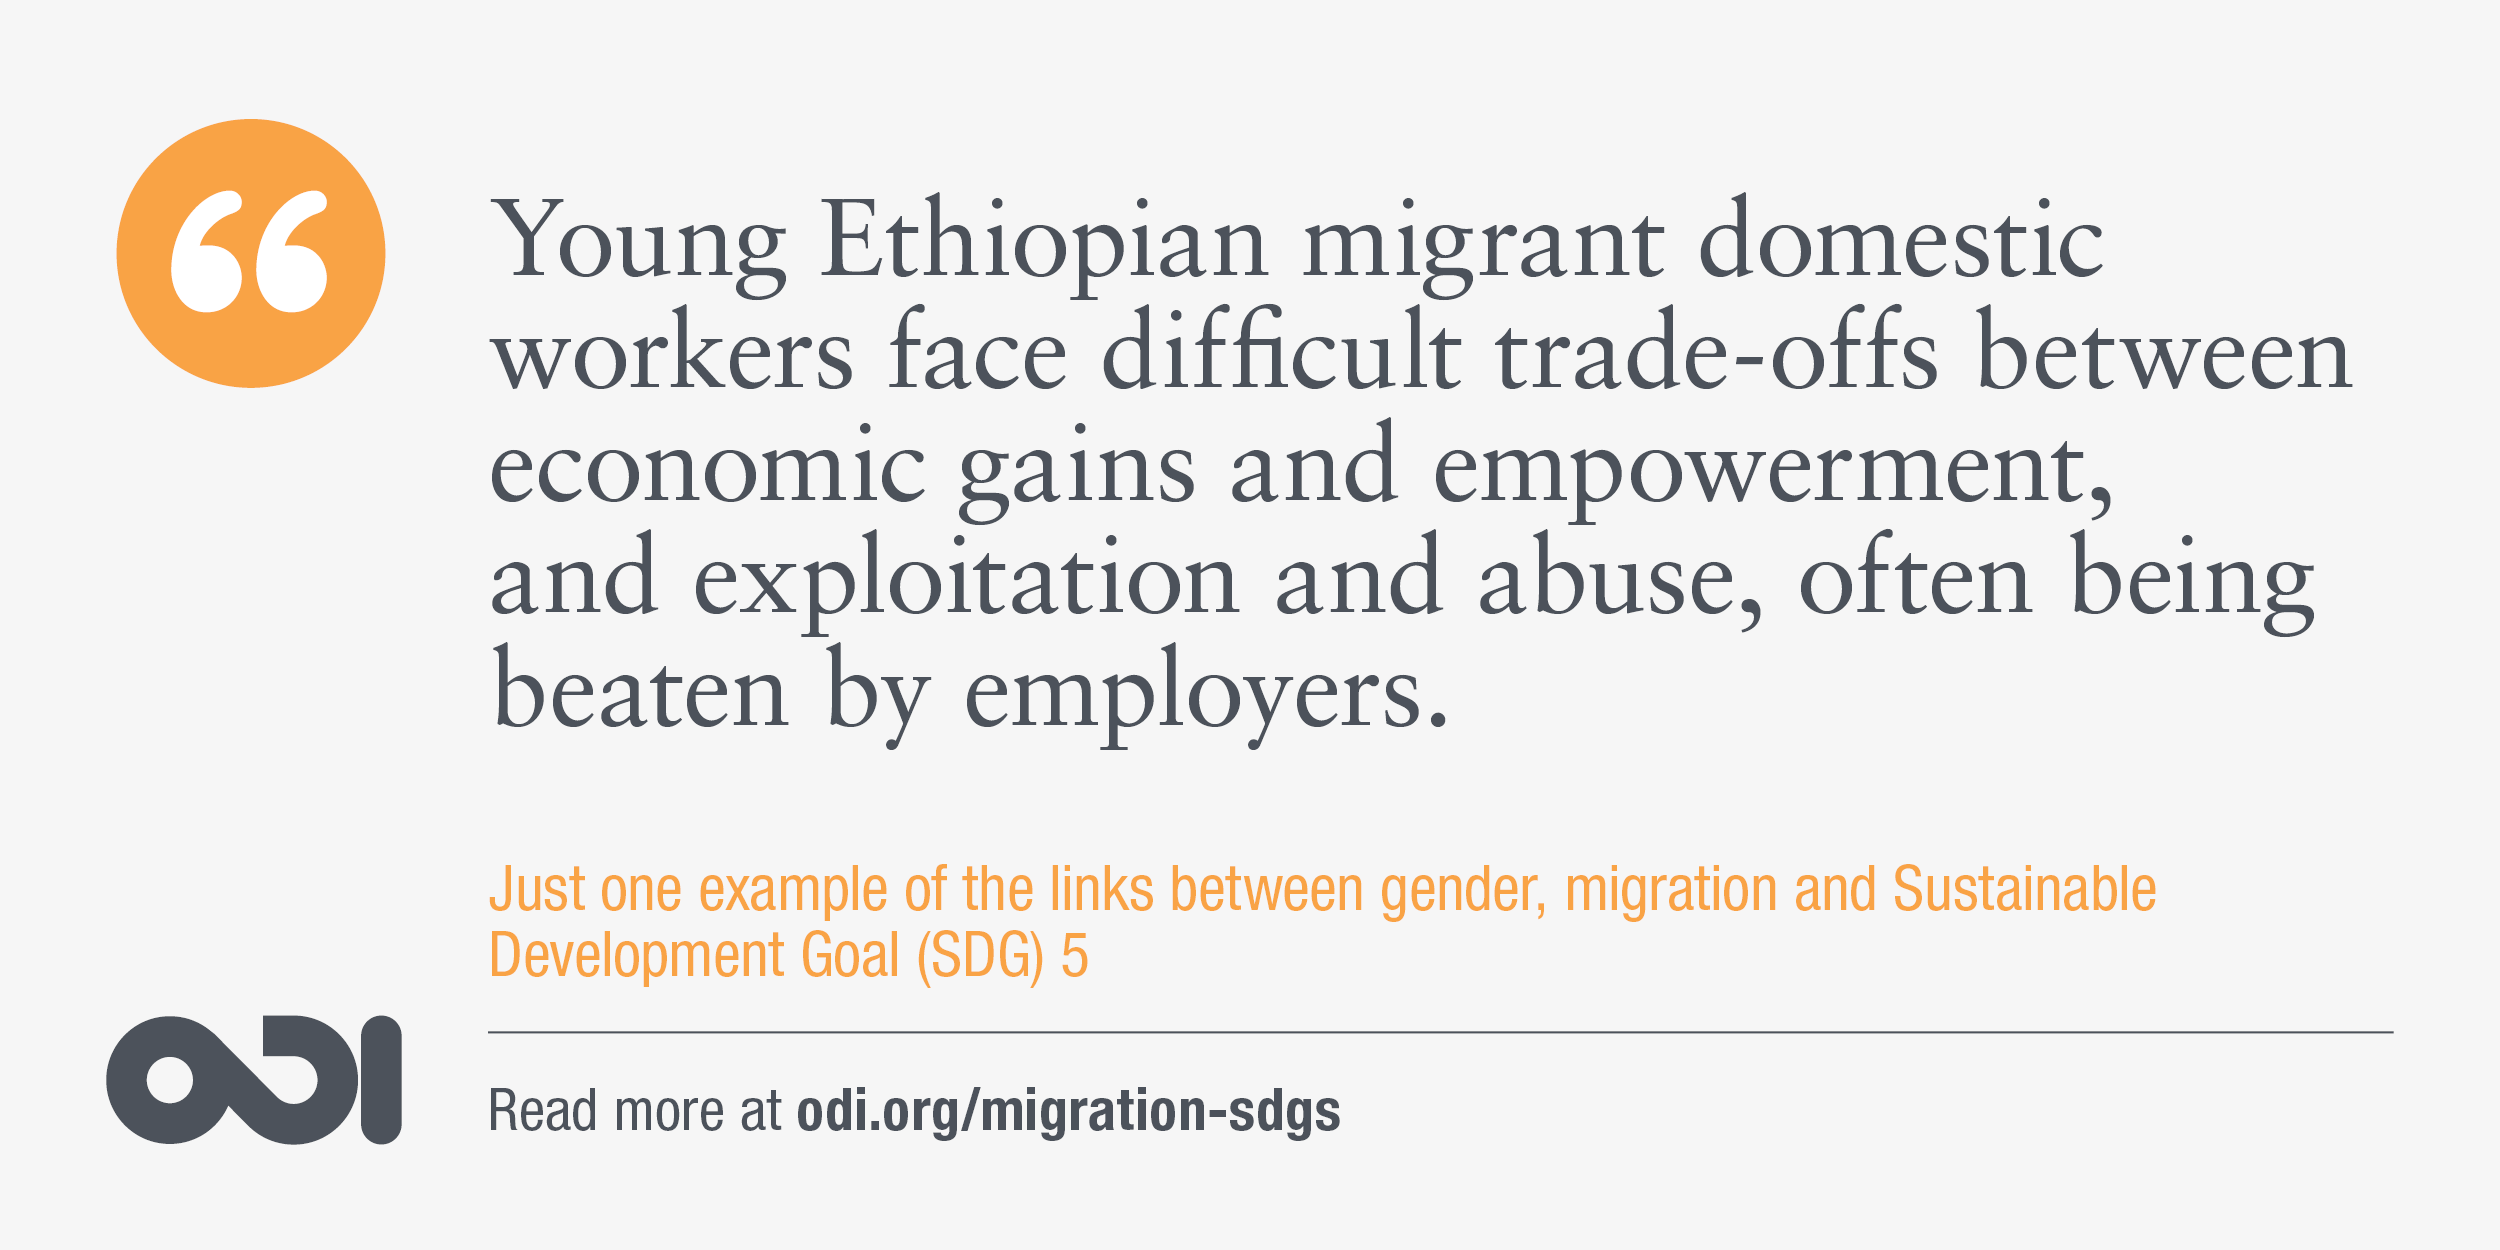 The links between gender, migration and SDG 5.